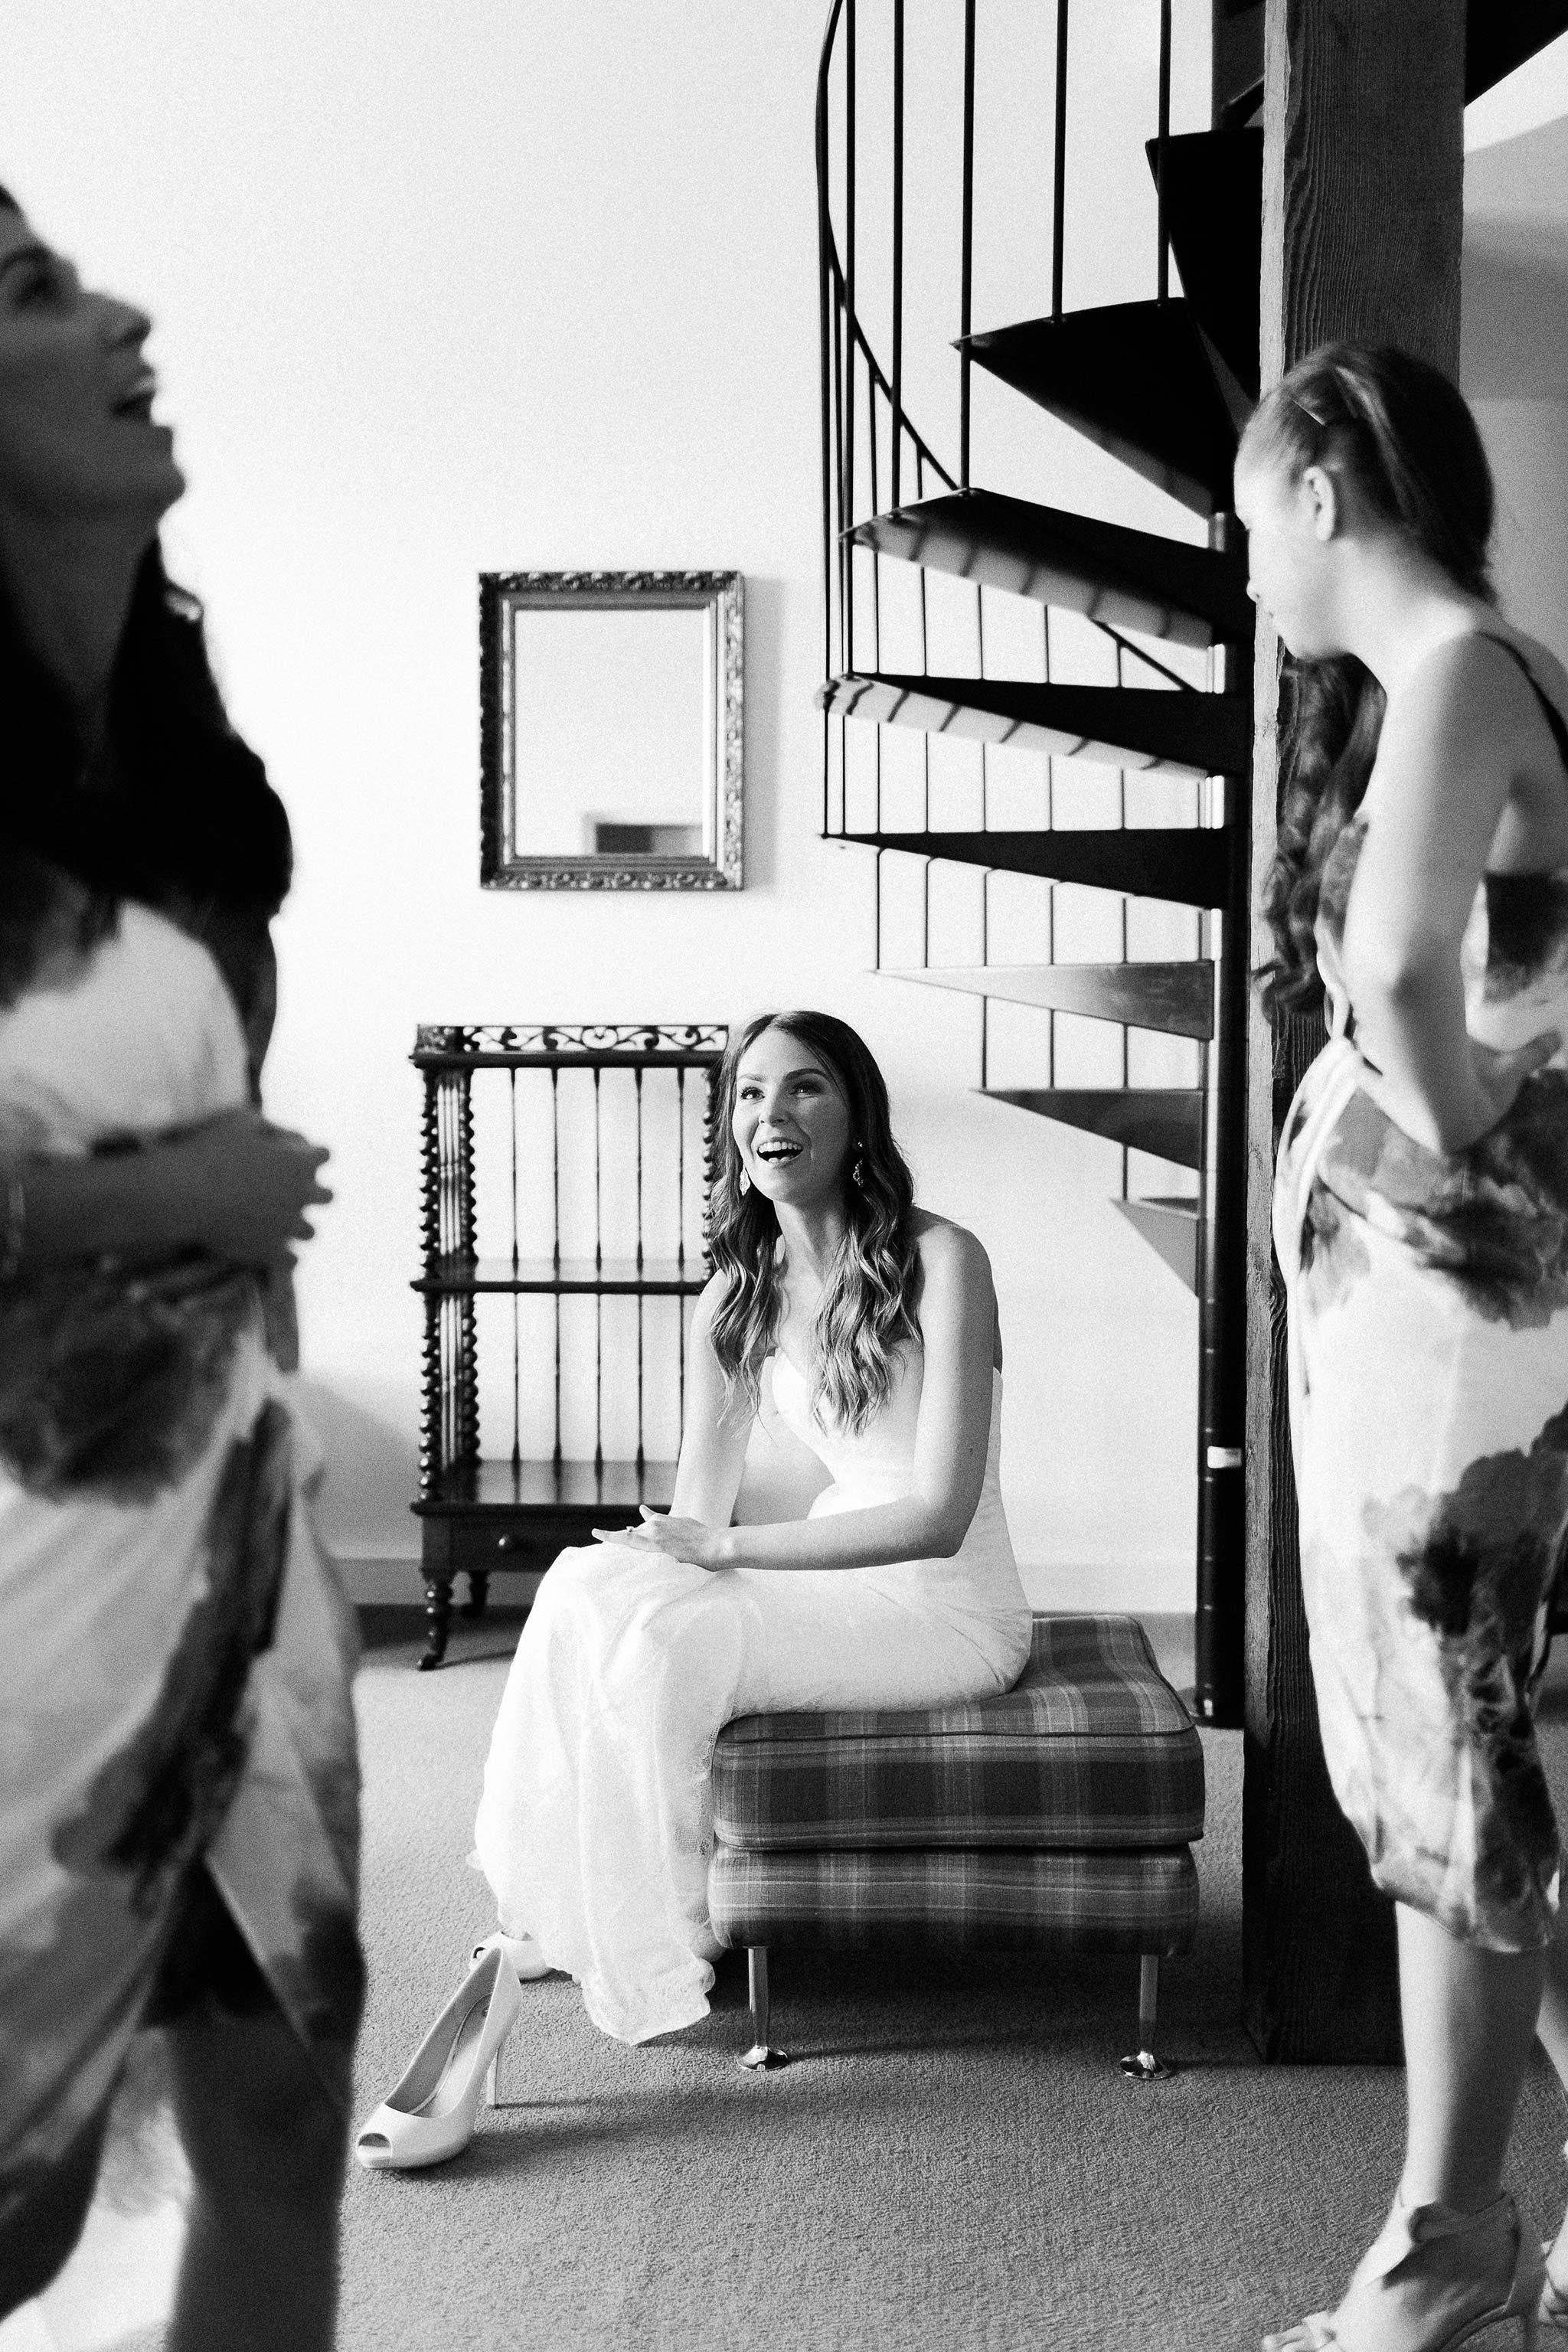 Launceston-Brickendon-barn-Wedding-Photographer-bride-getting-ready